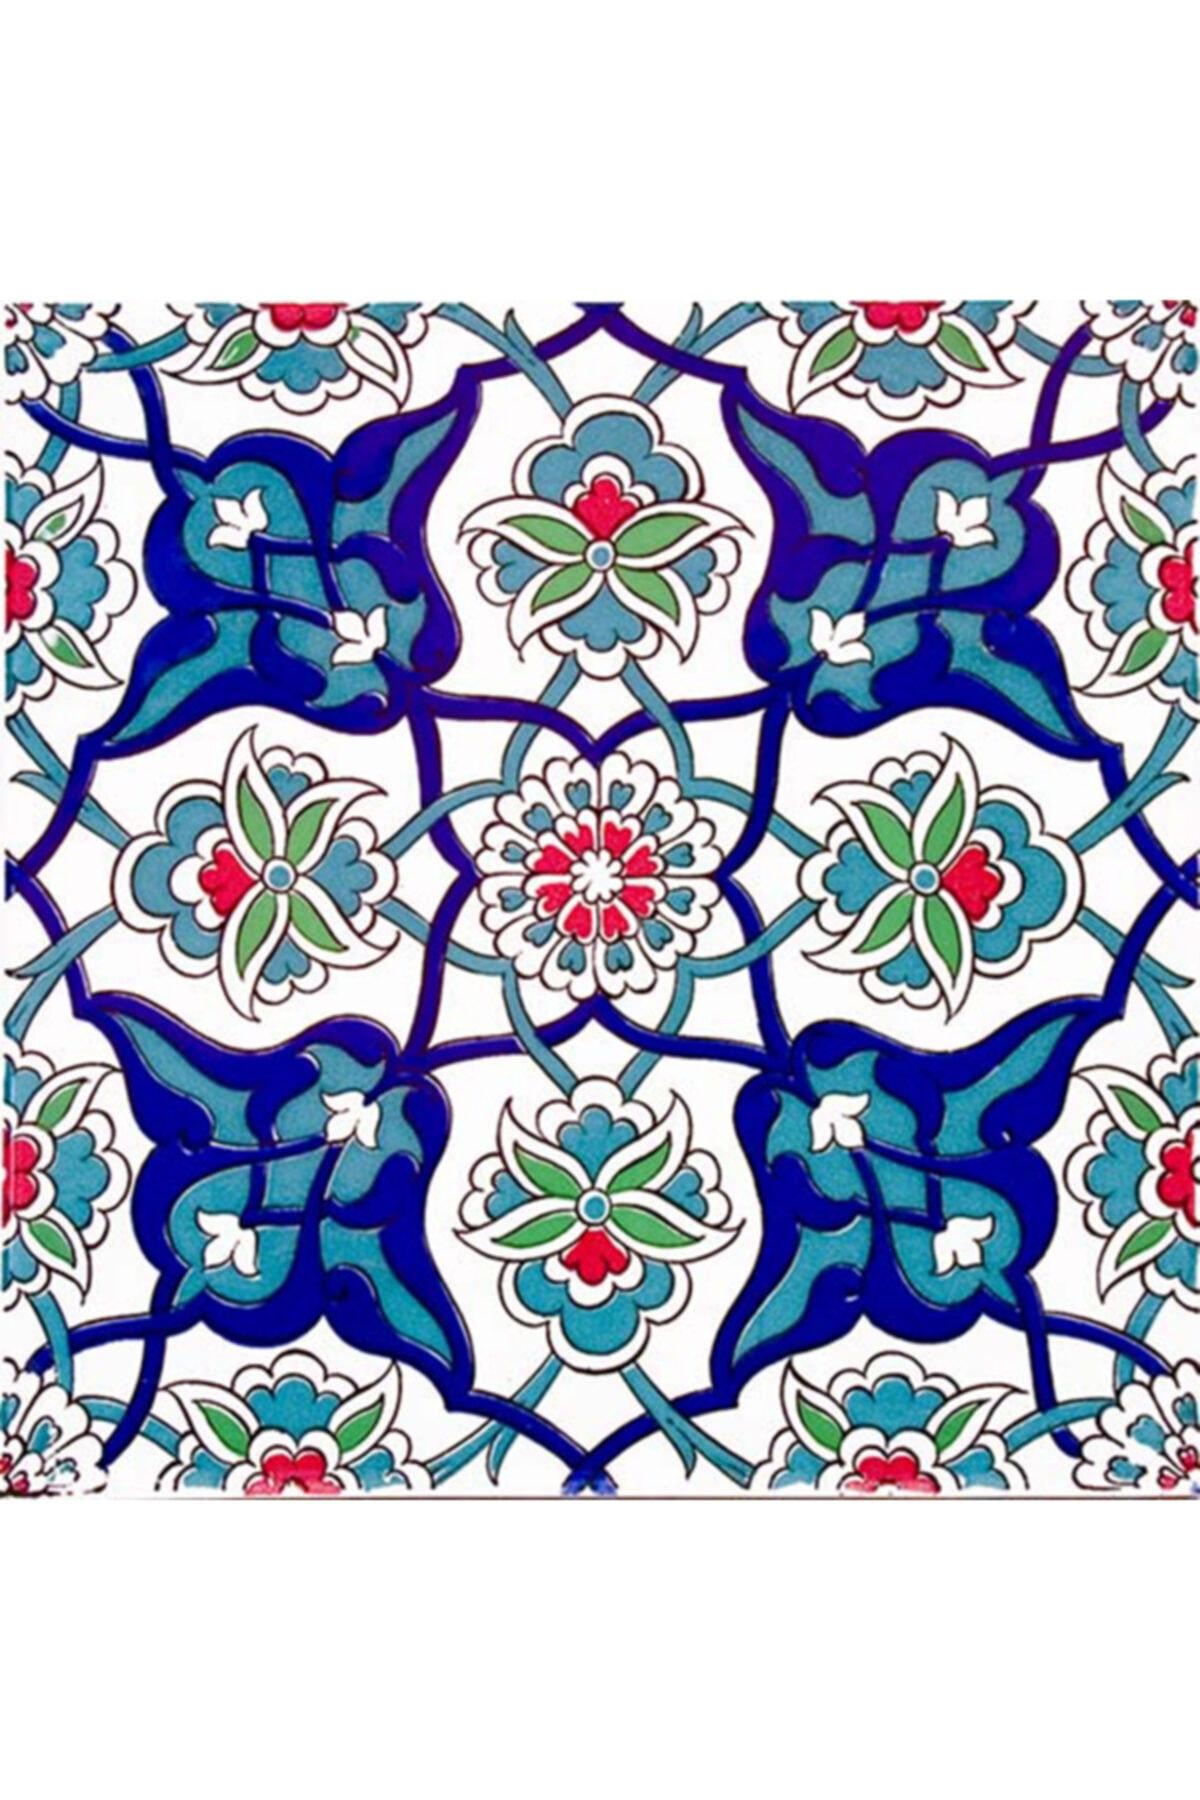 20x20 Cm Ac 27 Kütahya Çini Rumi Desenli Iznik Çini Karo